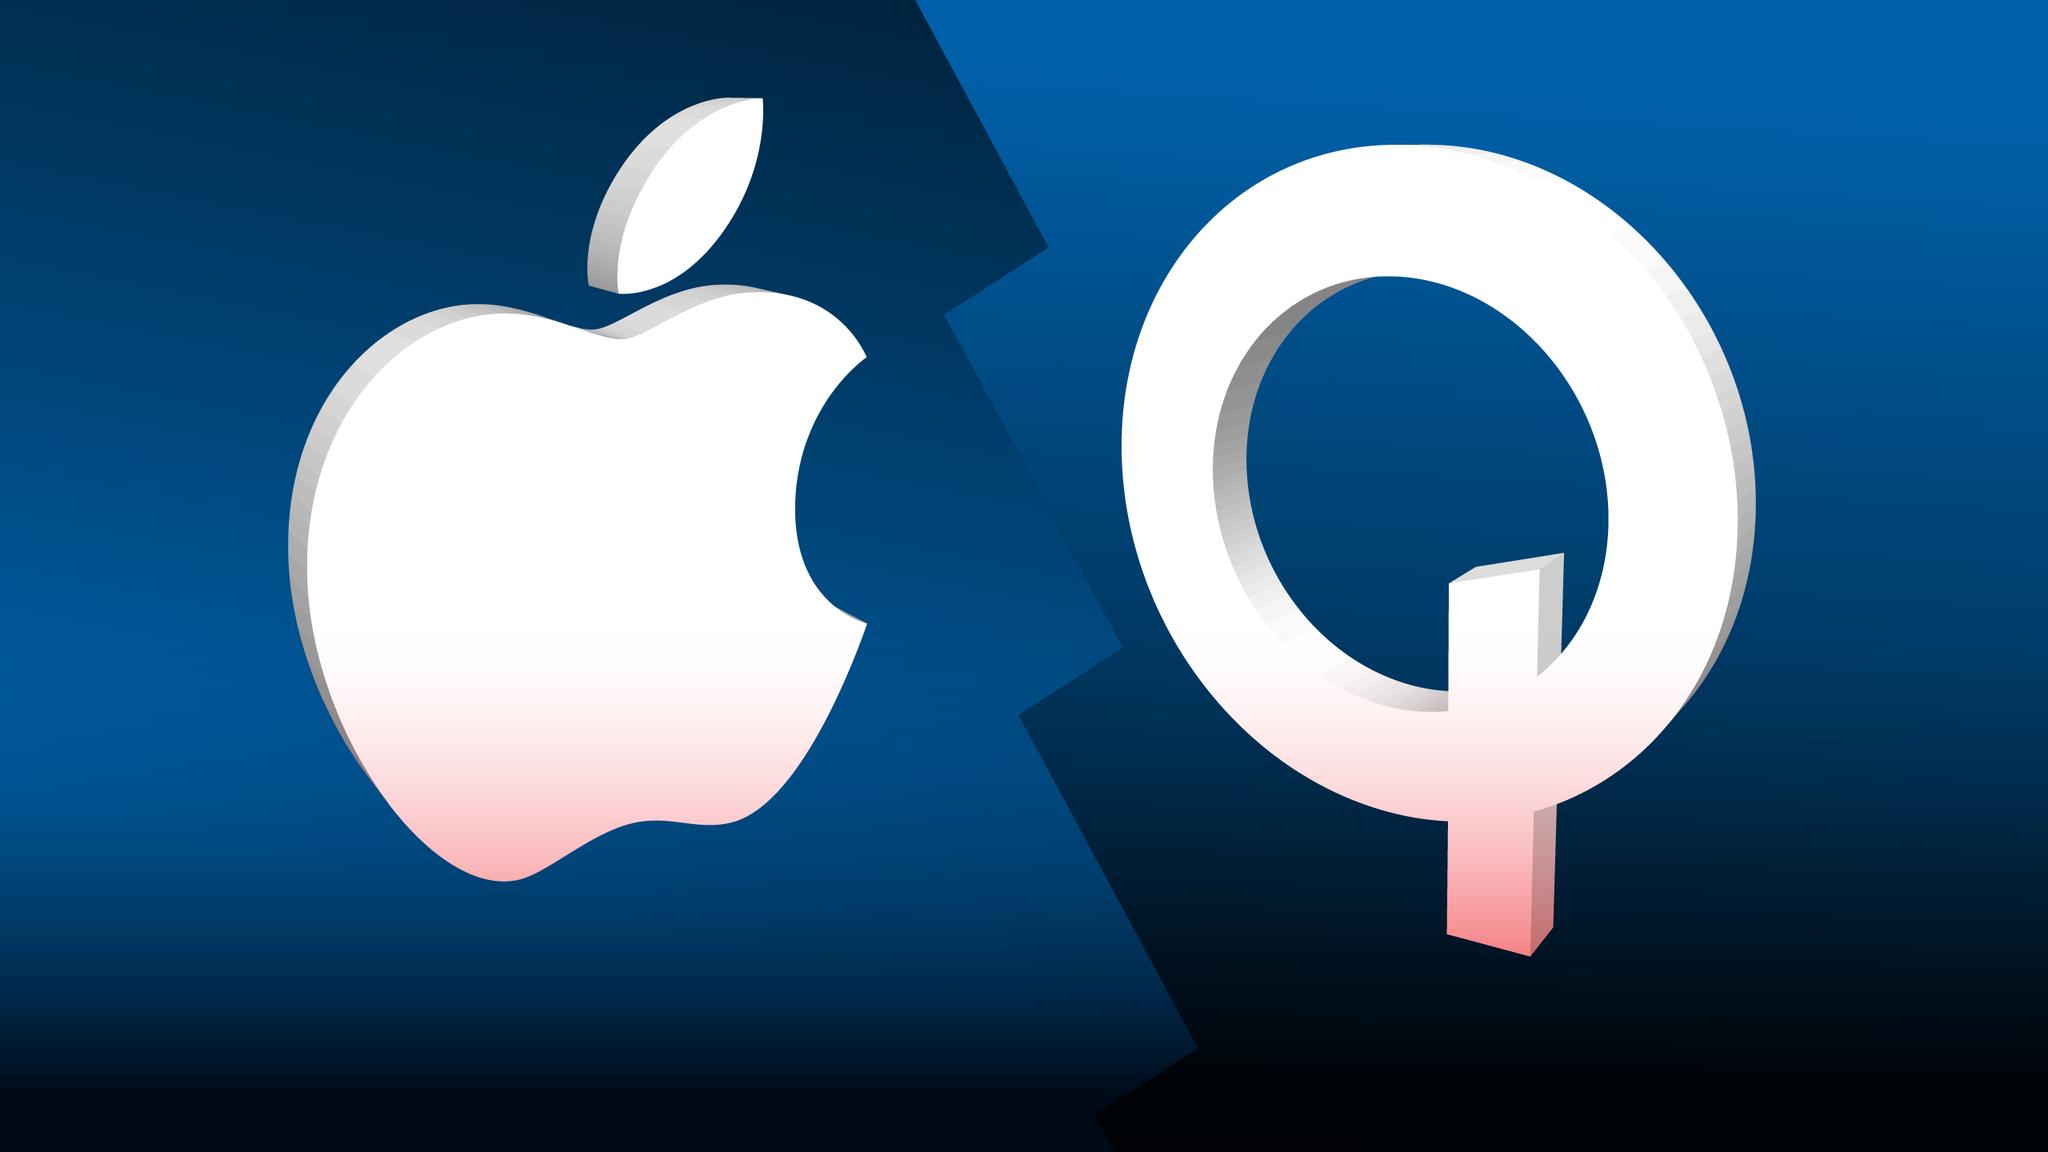 apple stops paying royalties to qualcomm  u2013 techcrunch